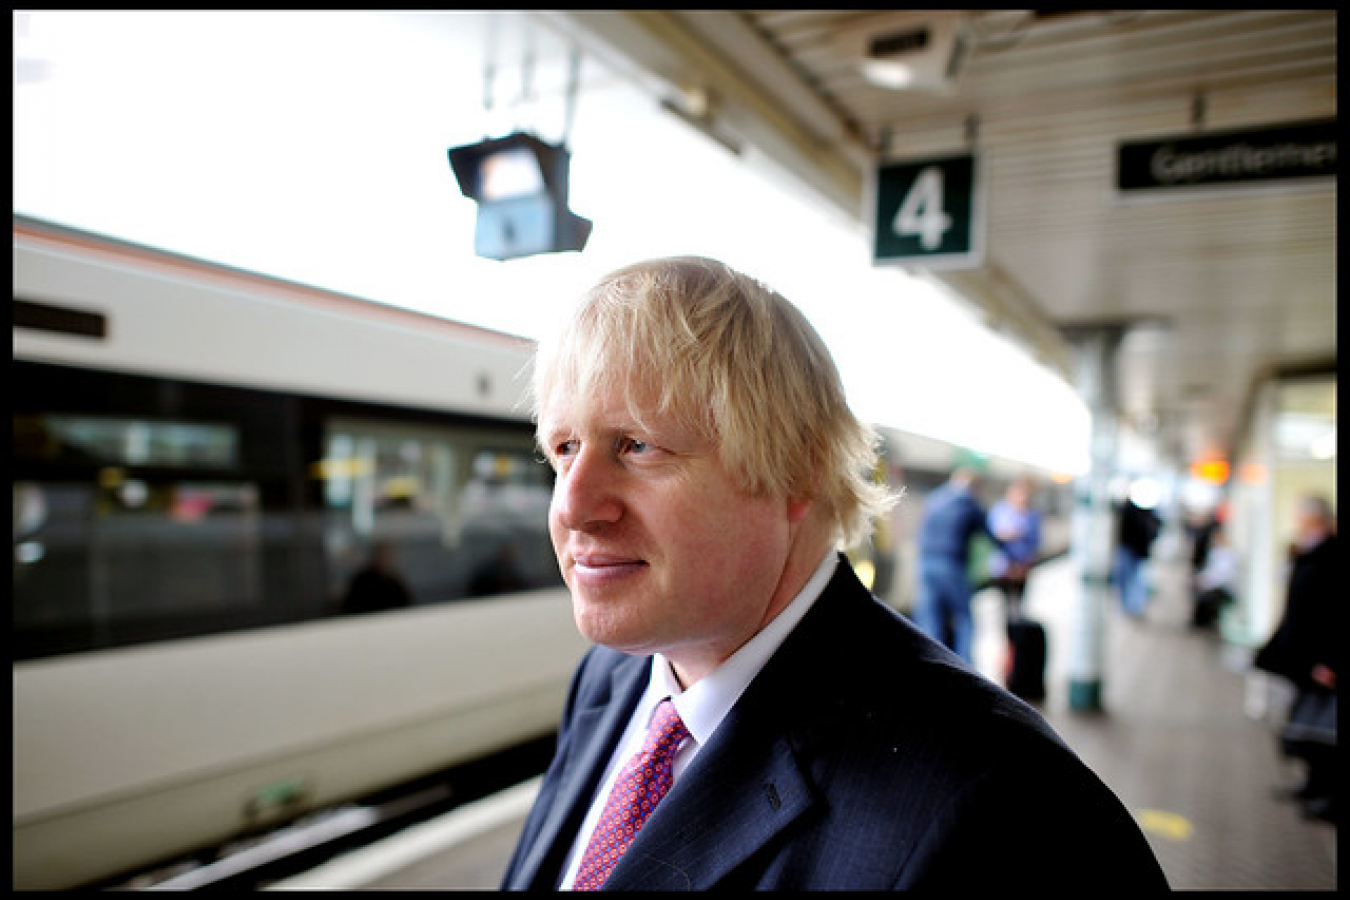 Boris Johnson likely to be next Prime Minister